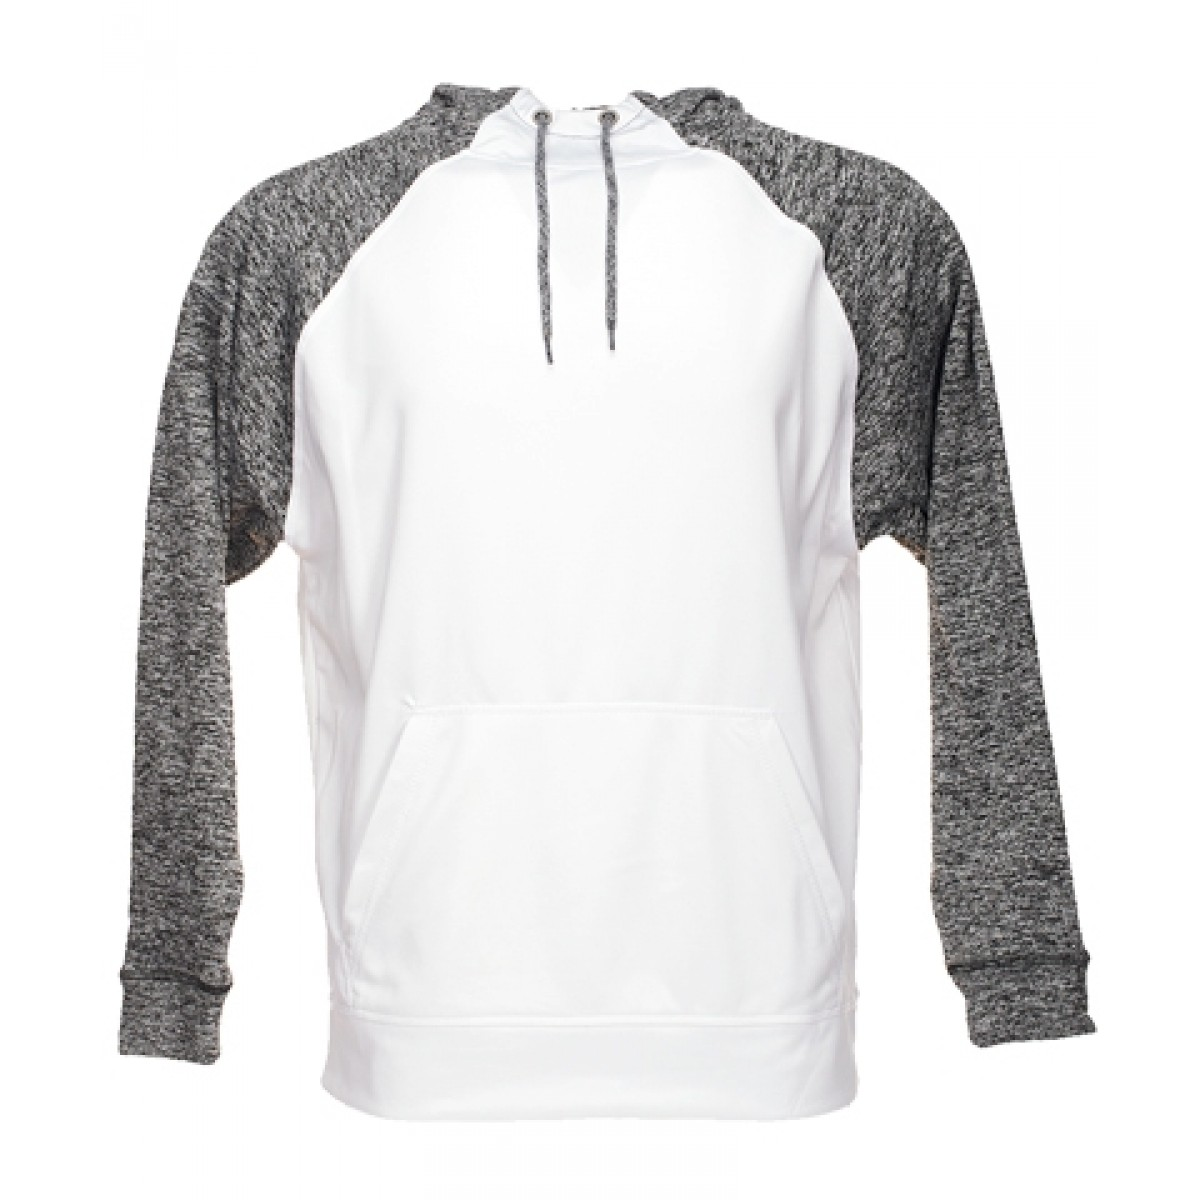 J America Cosmic Hooded Sweatshirt-White/Black-XL